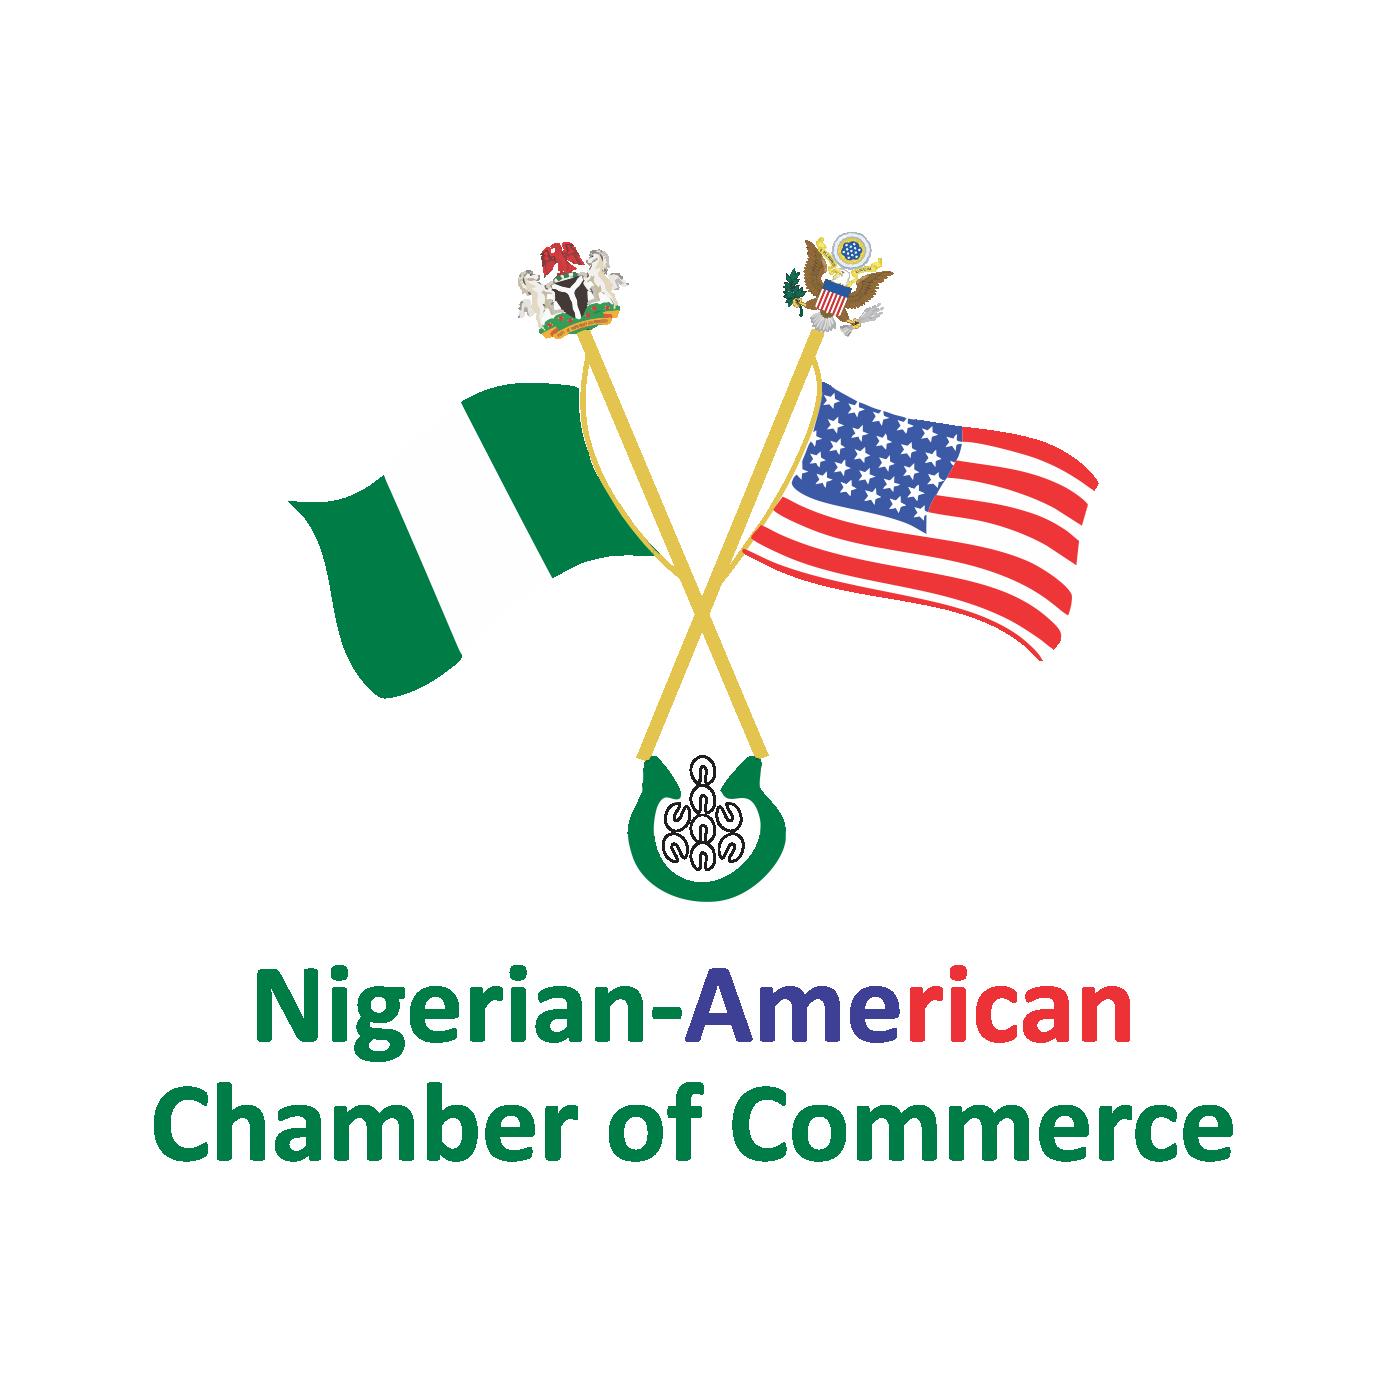 Chamber organises business improvement training